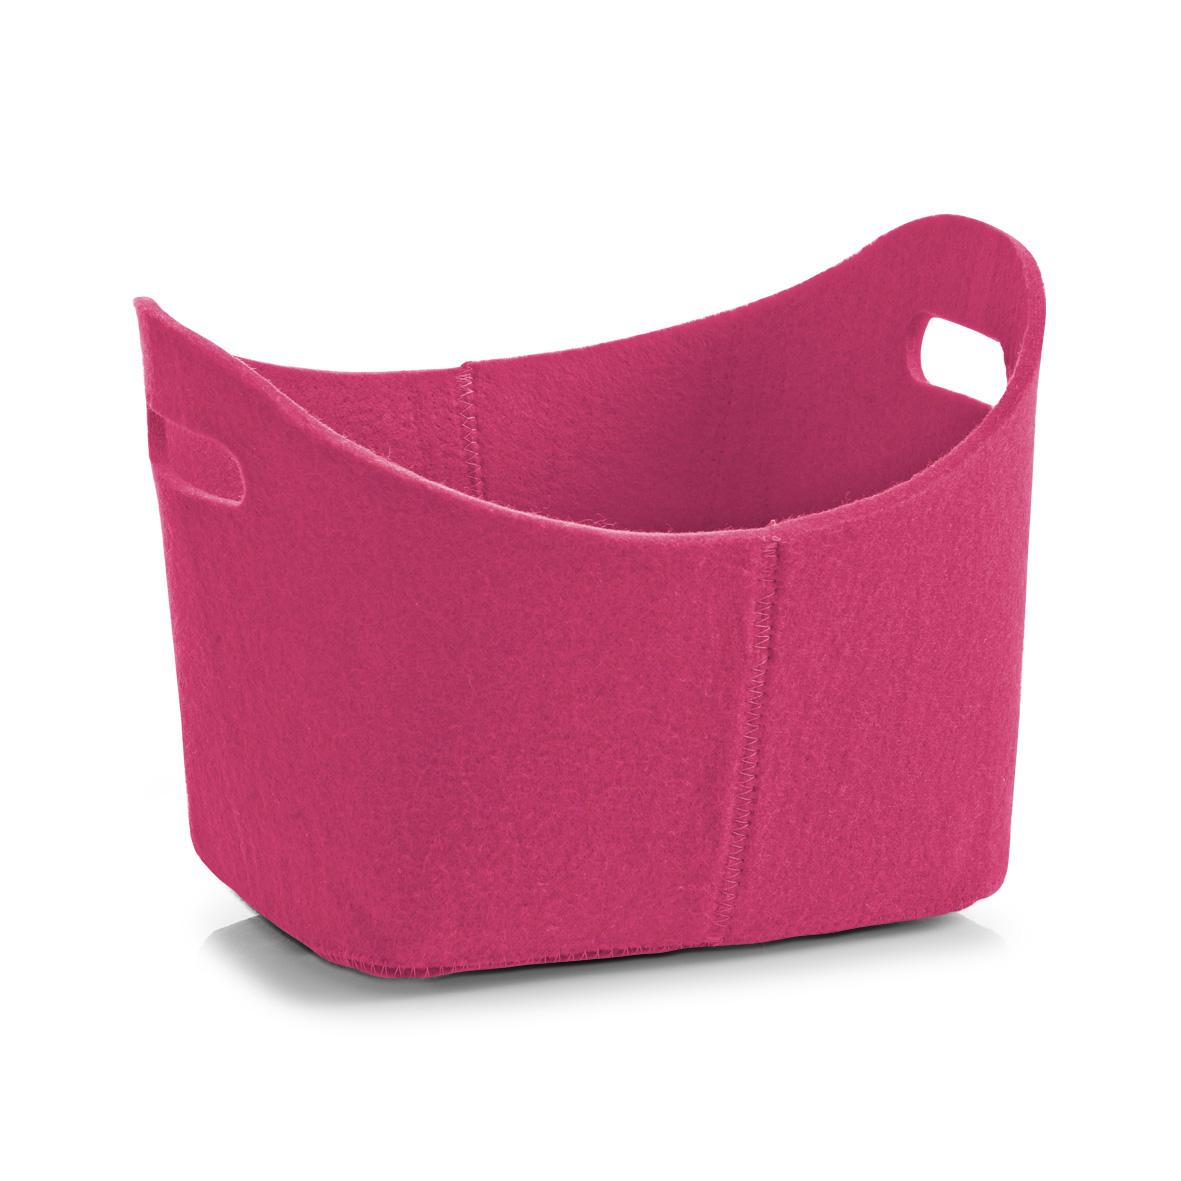 korb filz filzkorb aufbewahrungsbox holzkorb zeitungskorb filztasche ebay. Black Bedroom Furniture Sets. Home Design Ideas